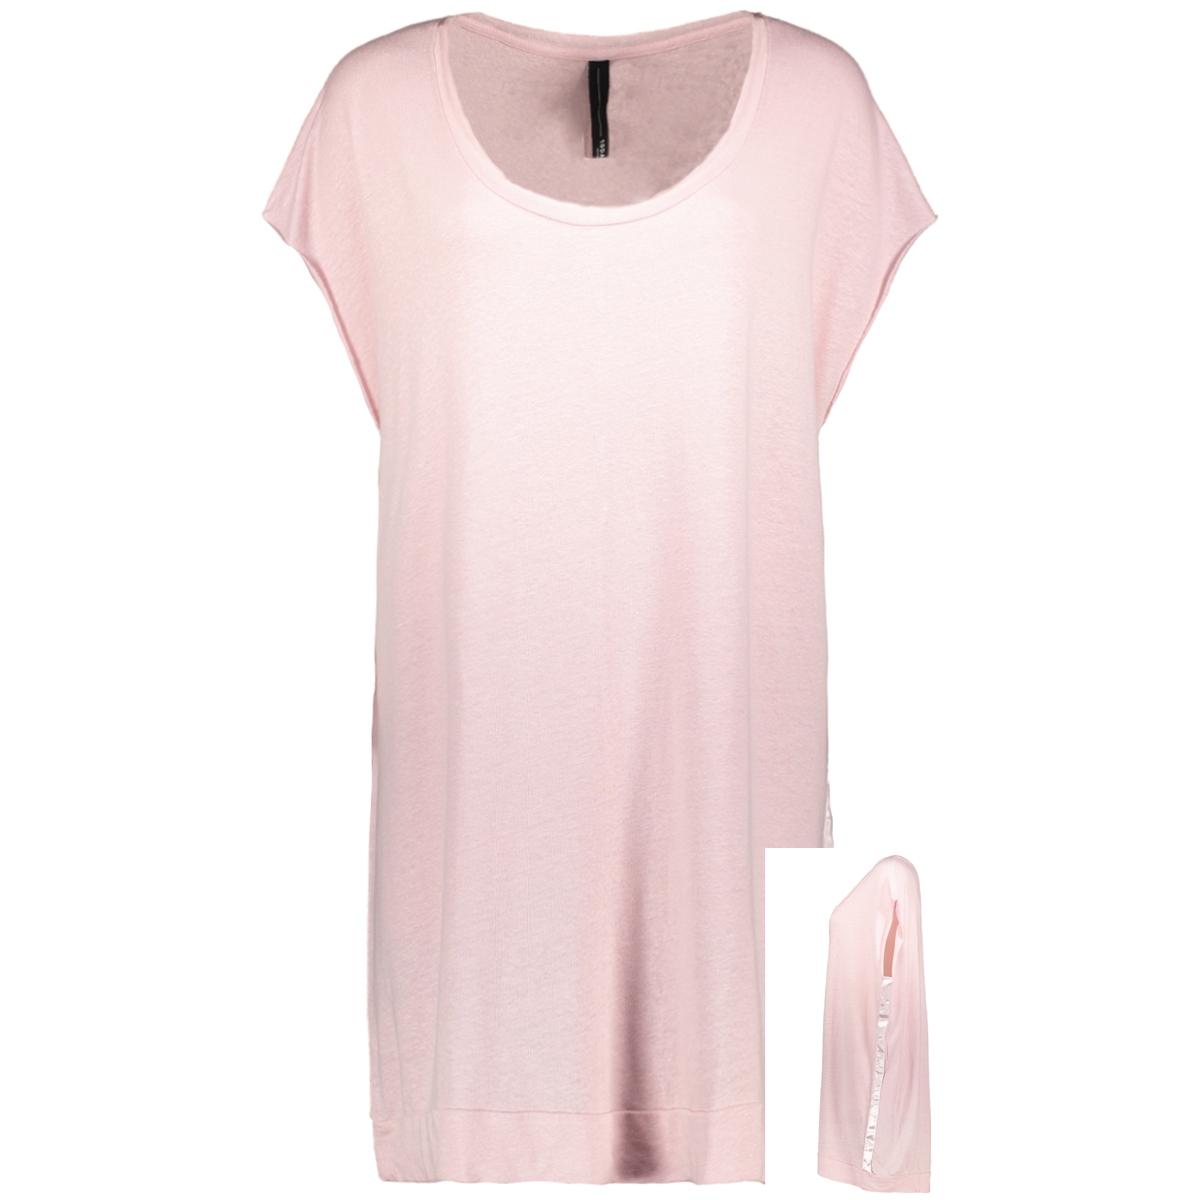 tunic linen 20 354 0205 10 days tuniek soft dirty pink